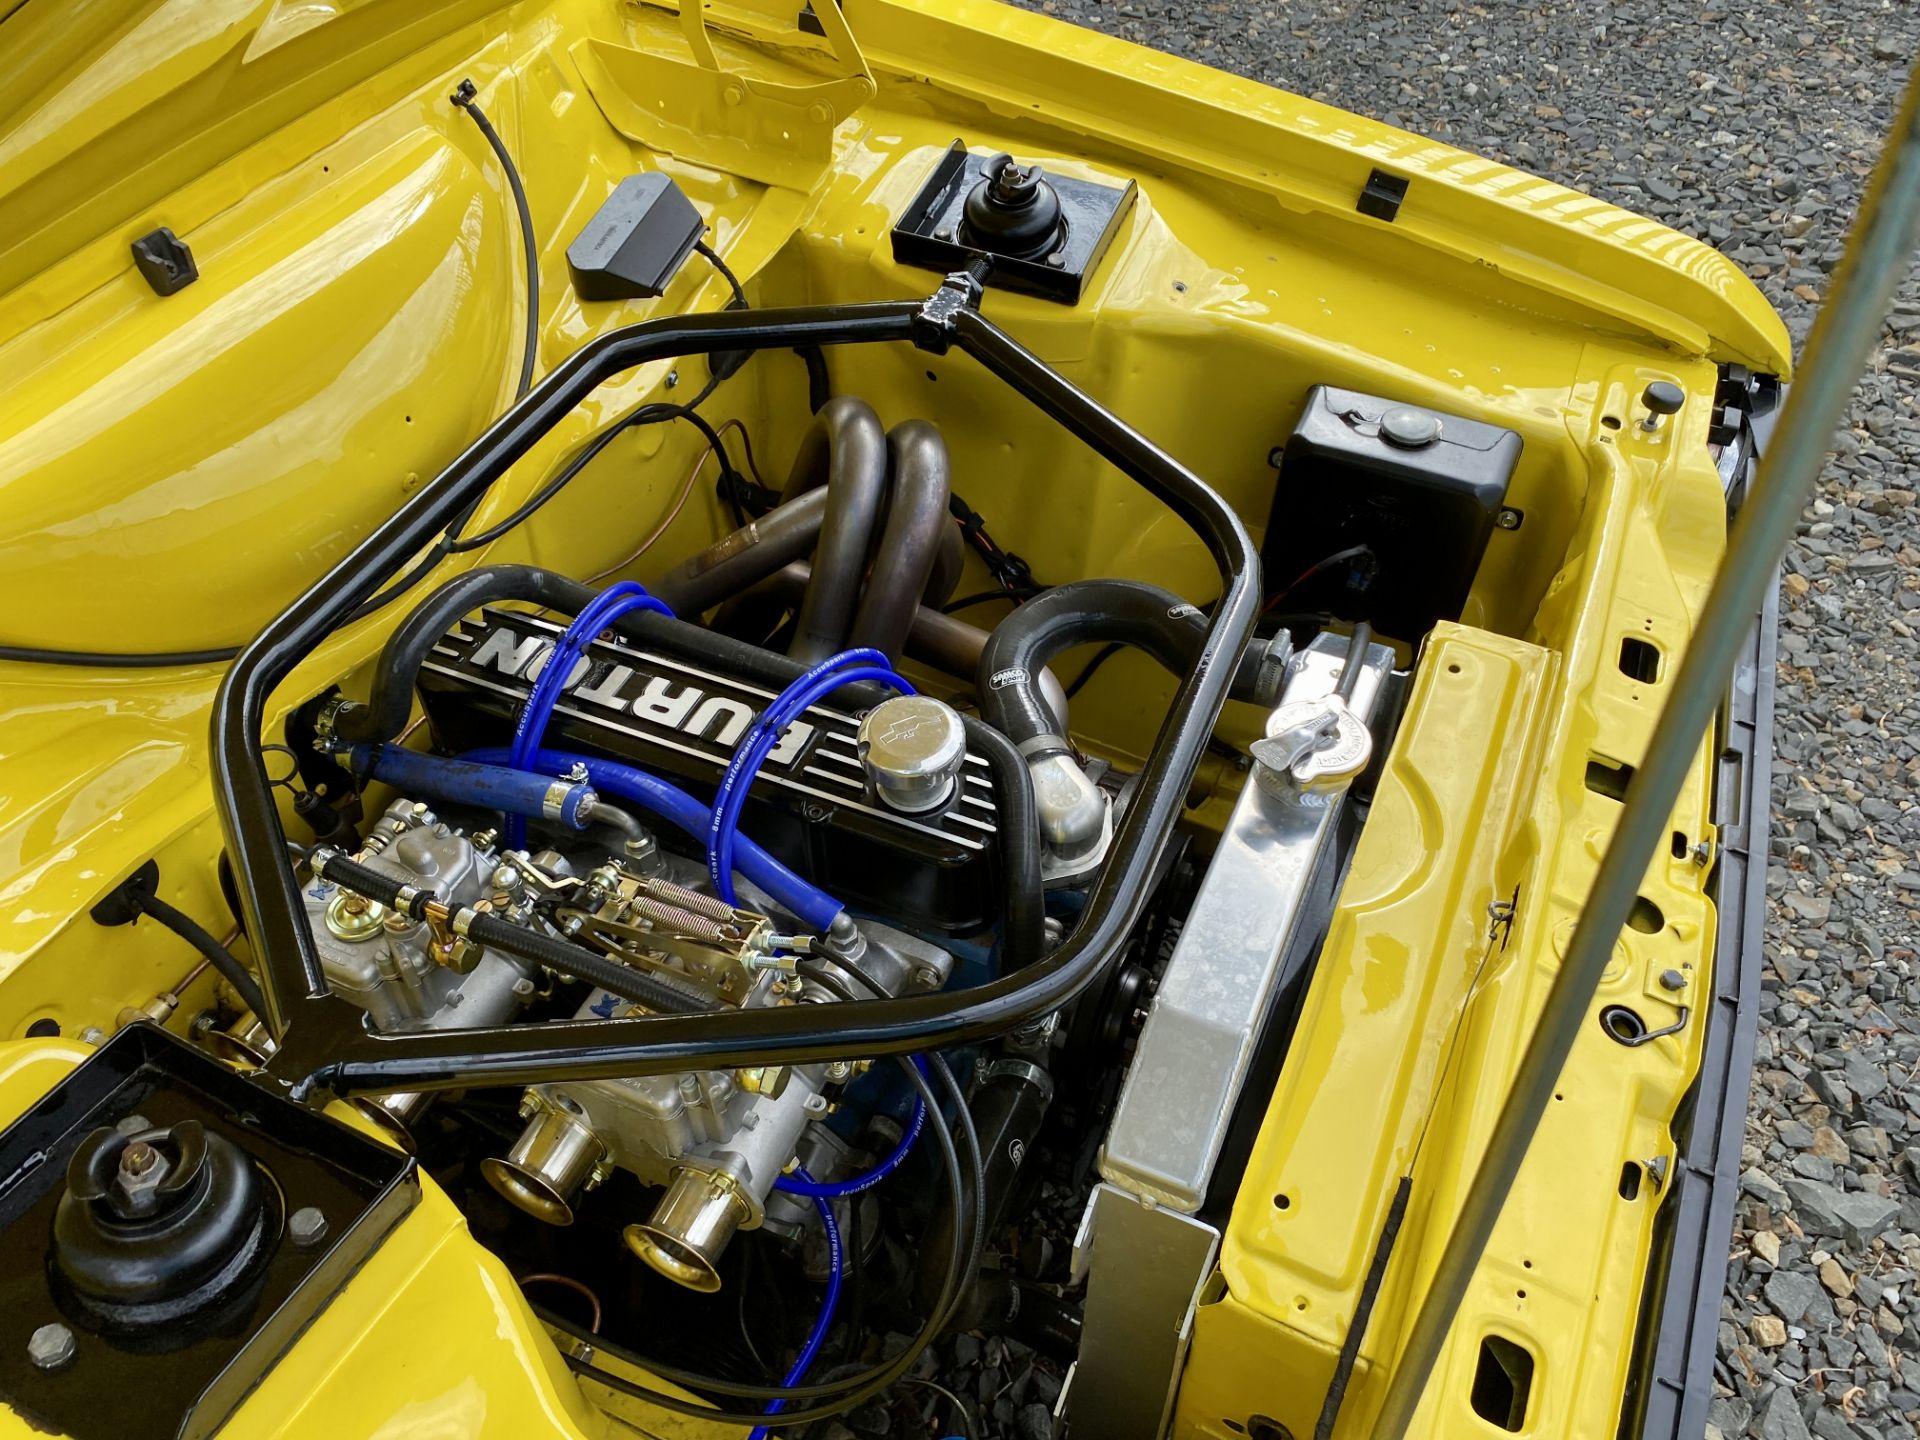 Ford Escort MK2 - Image 57 of 58